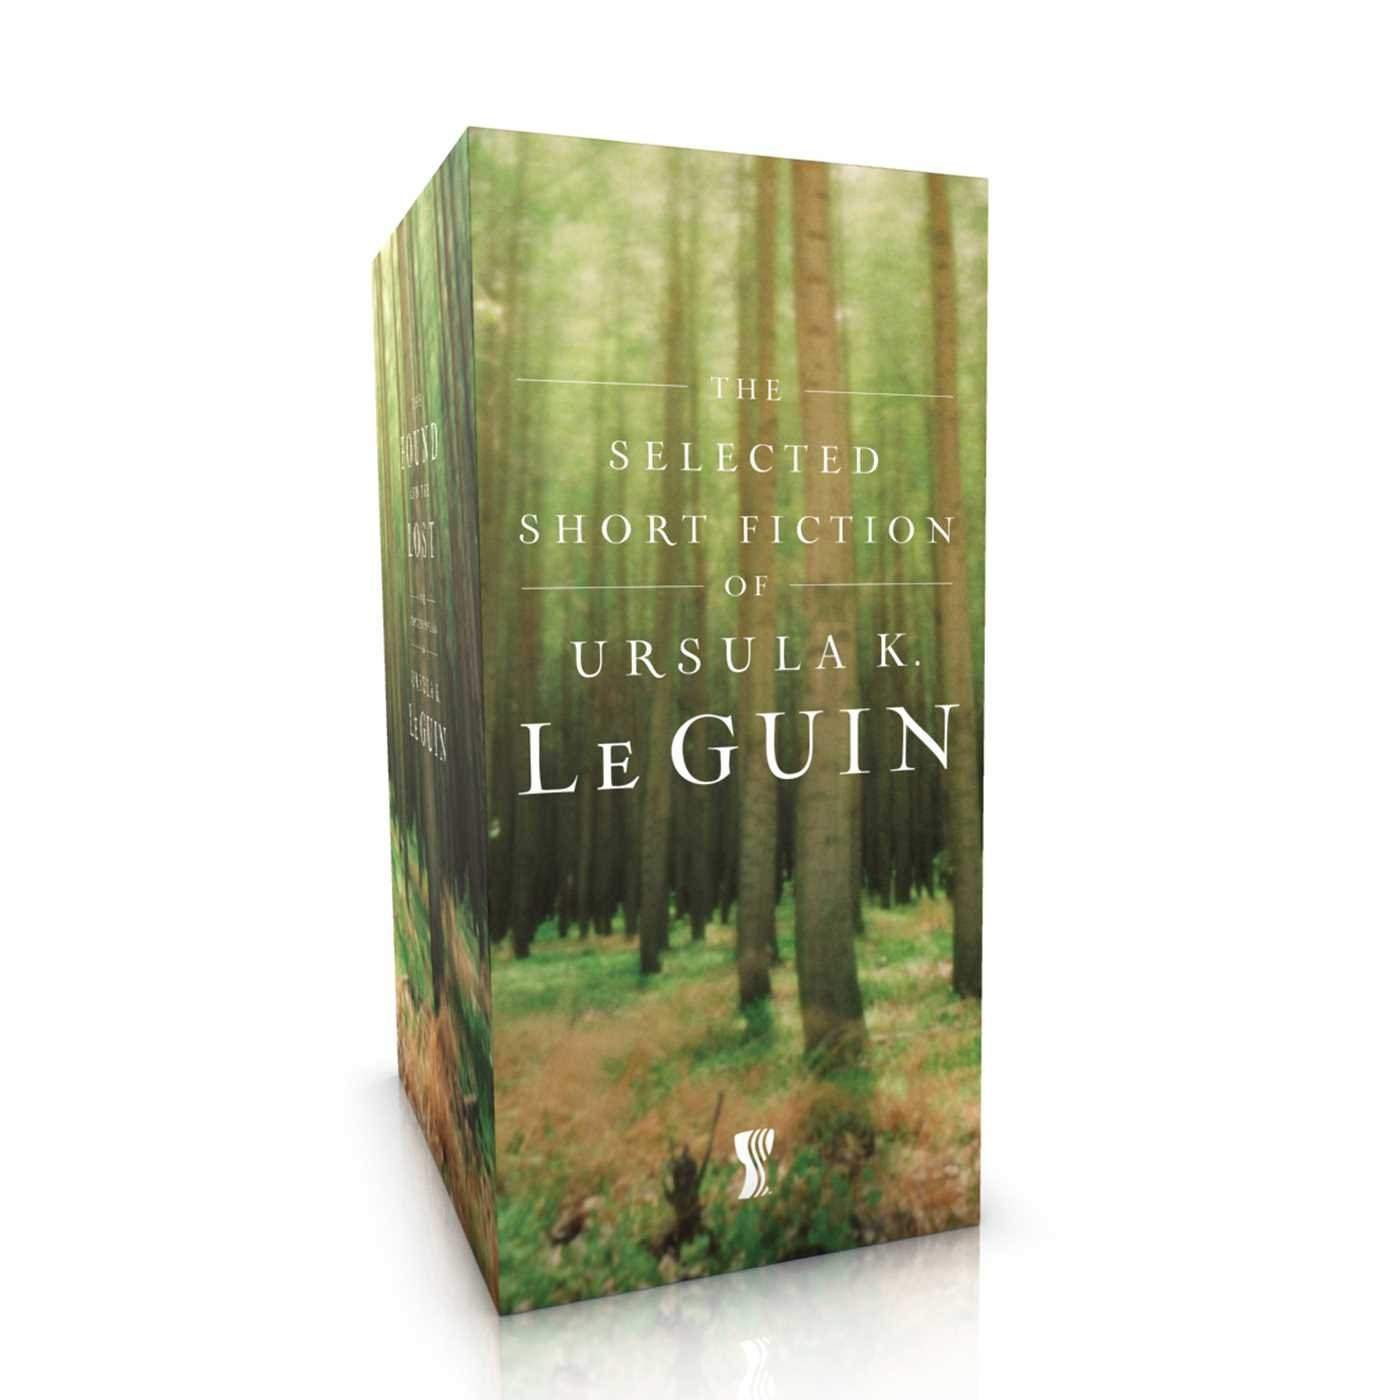 Follow the Author. Ursula K. Le Guin